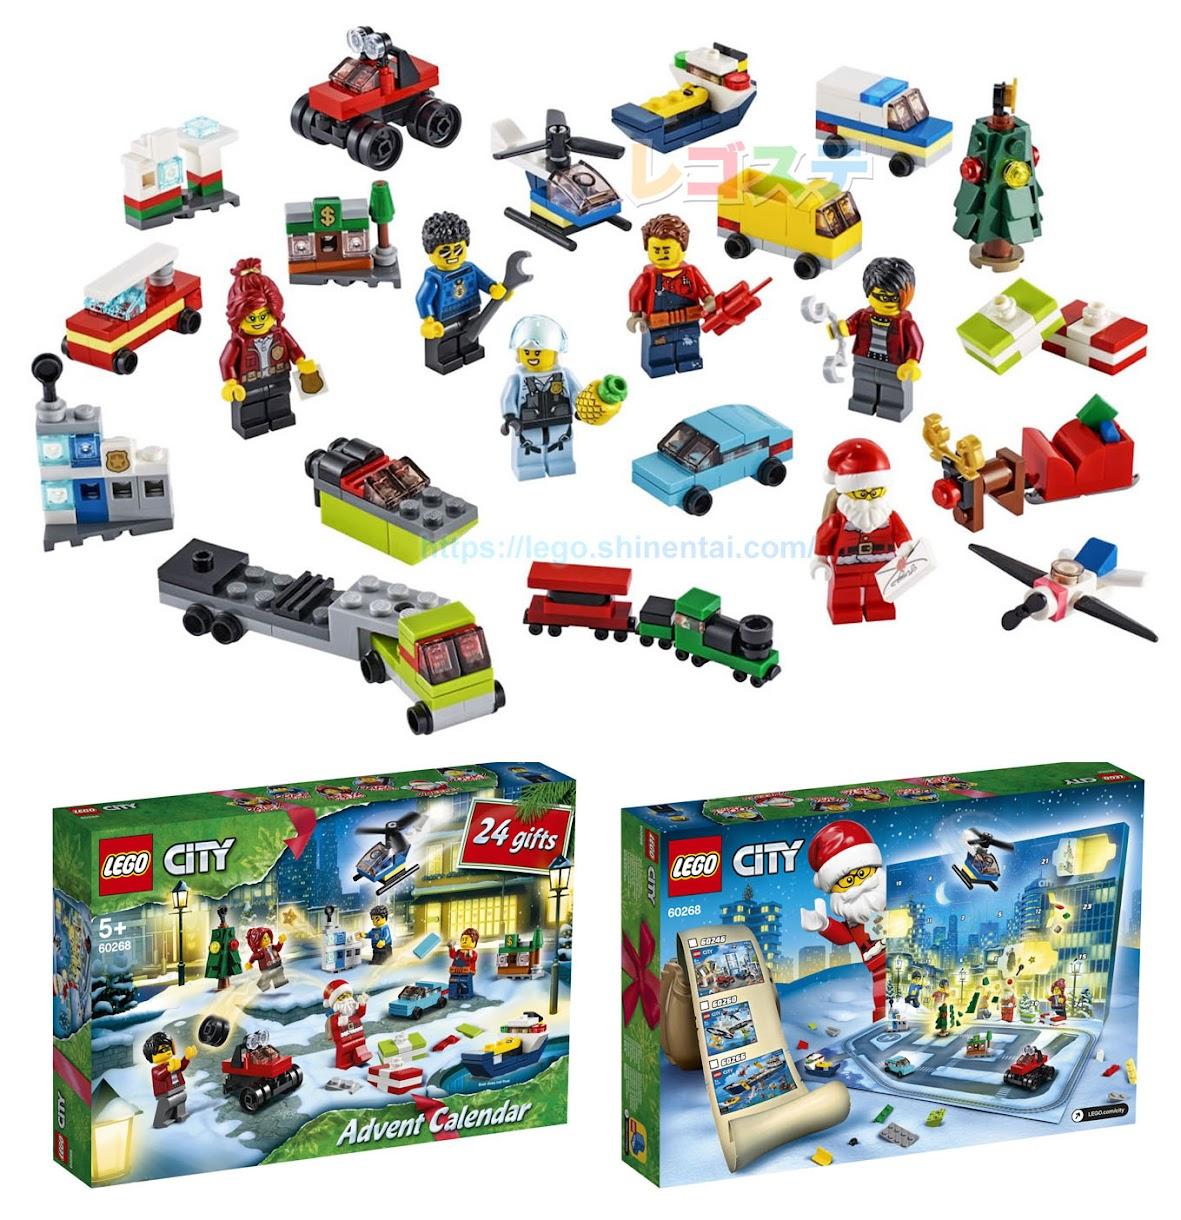 60268 LEGO シティ 2020 アドベントカレンダー:LEGO City 2020 Advent Calendar